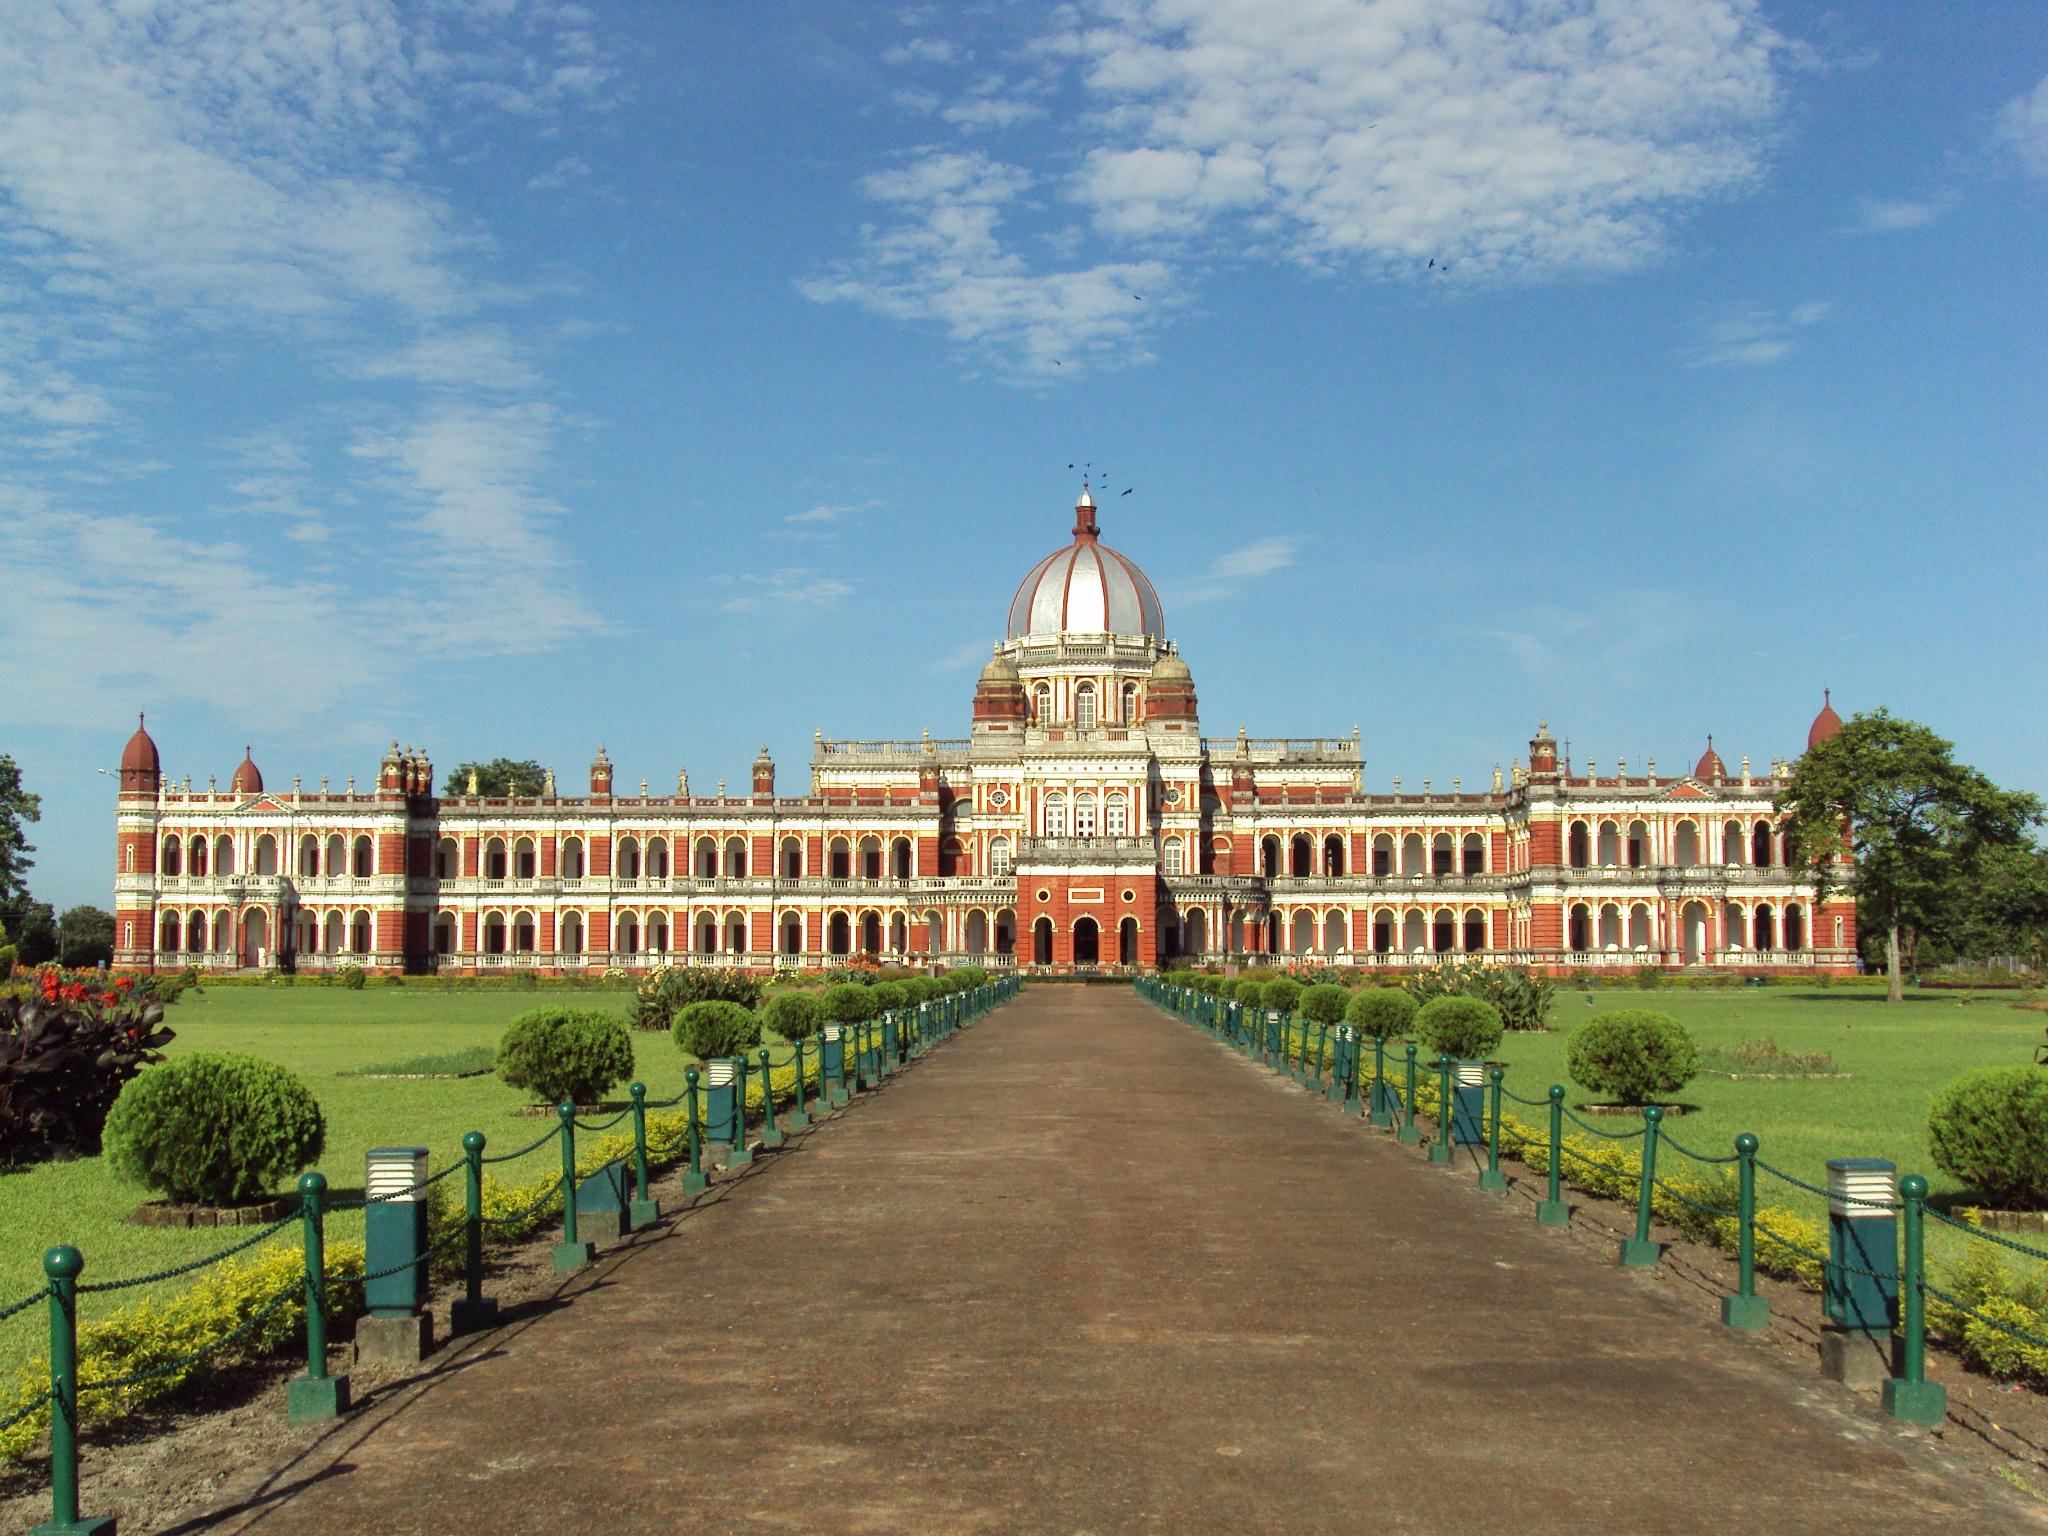 Cooch Behar Royal Palace